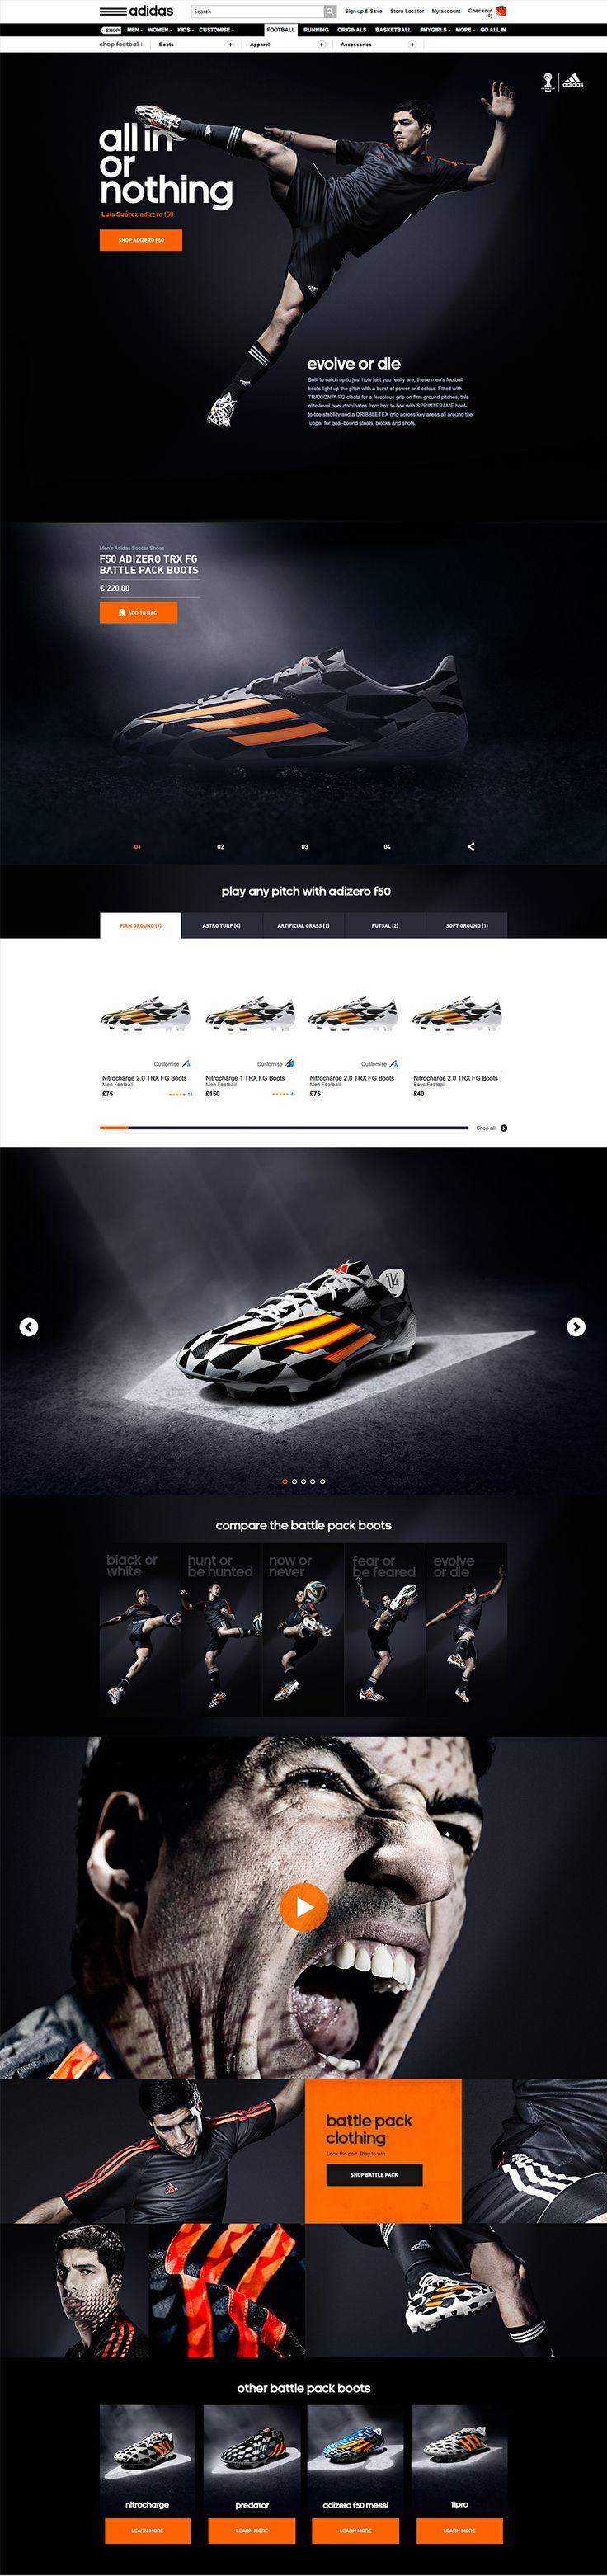 adidas - Battle Pack